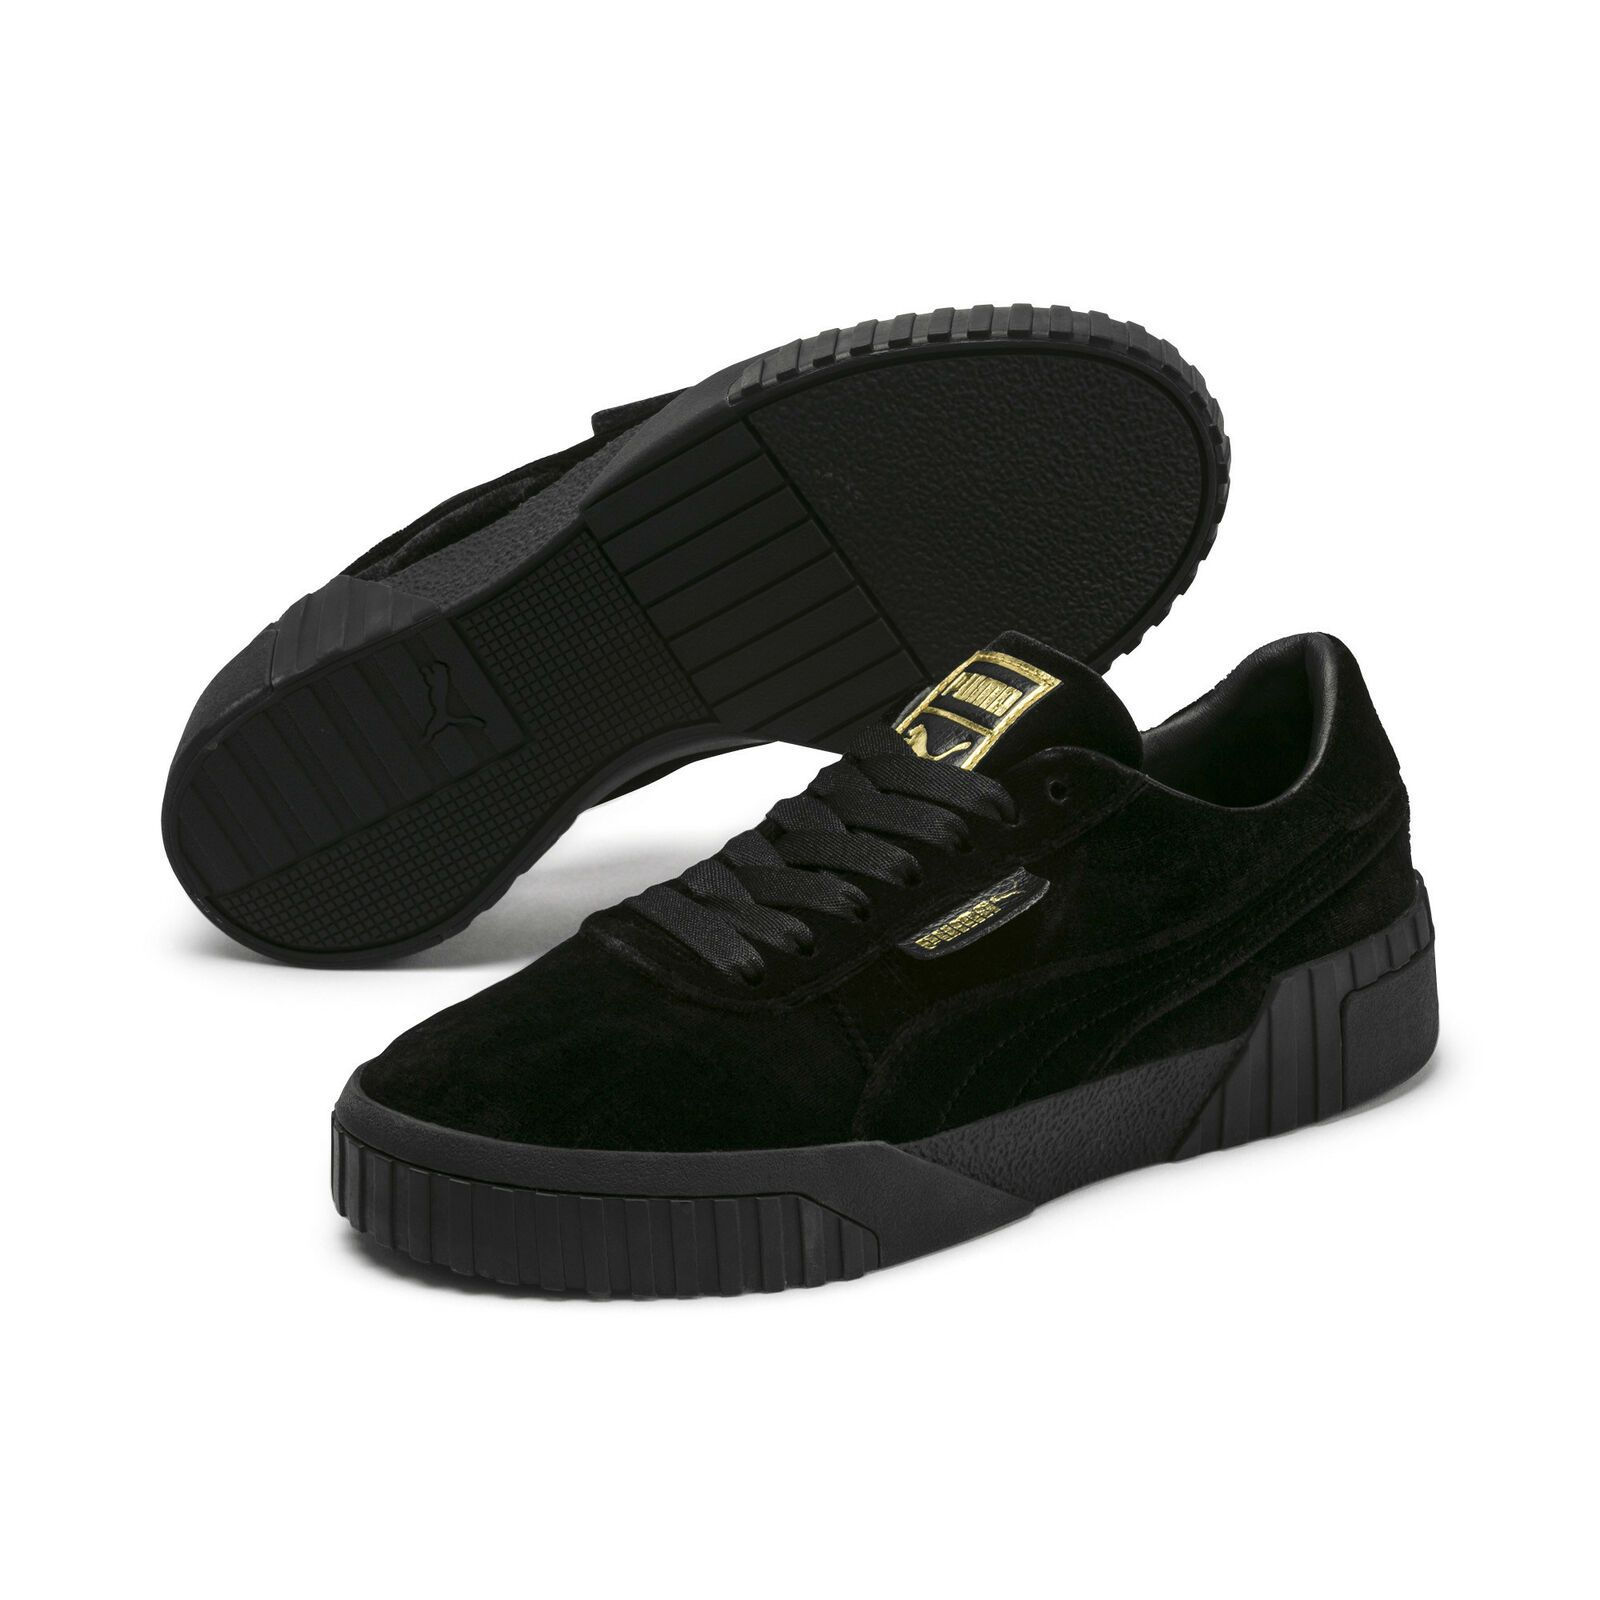 PUMA Women's Cali Velvet Sneakers in